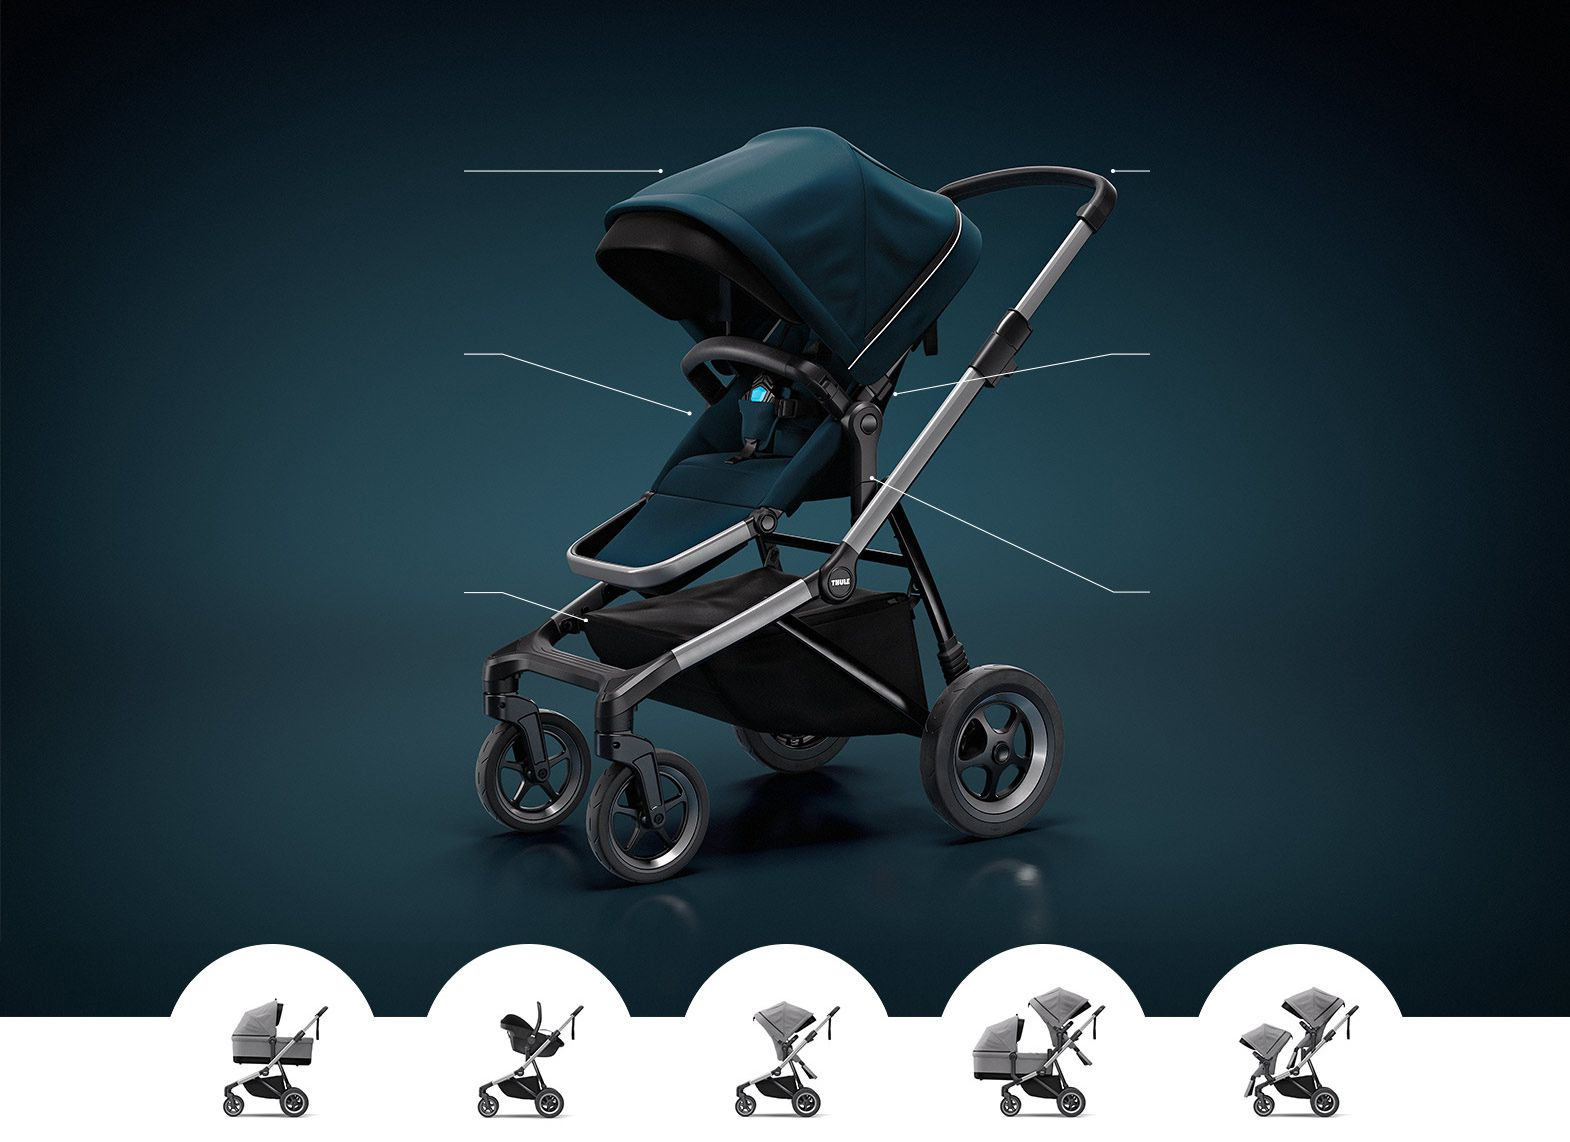 Carrinho de Bebê Thule Sleek Midnight e Sleek Bassinet (Moisés) - Preto